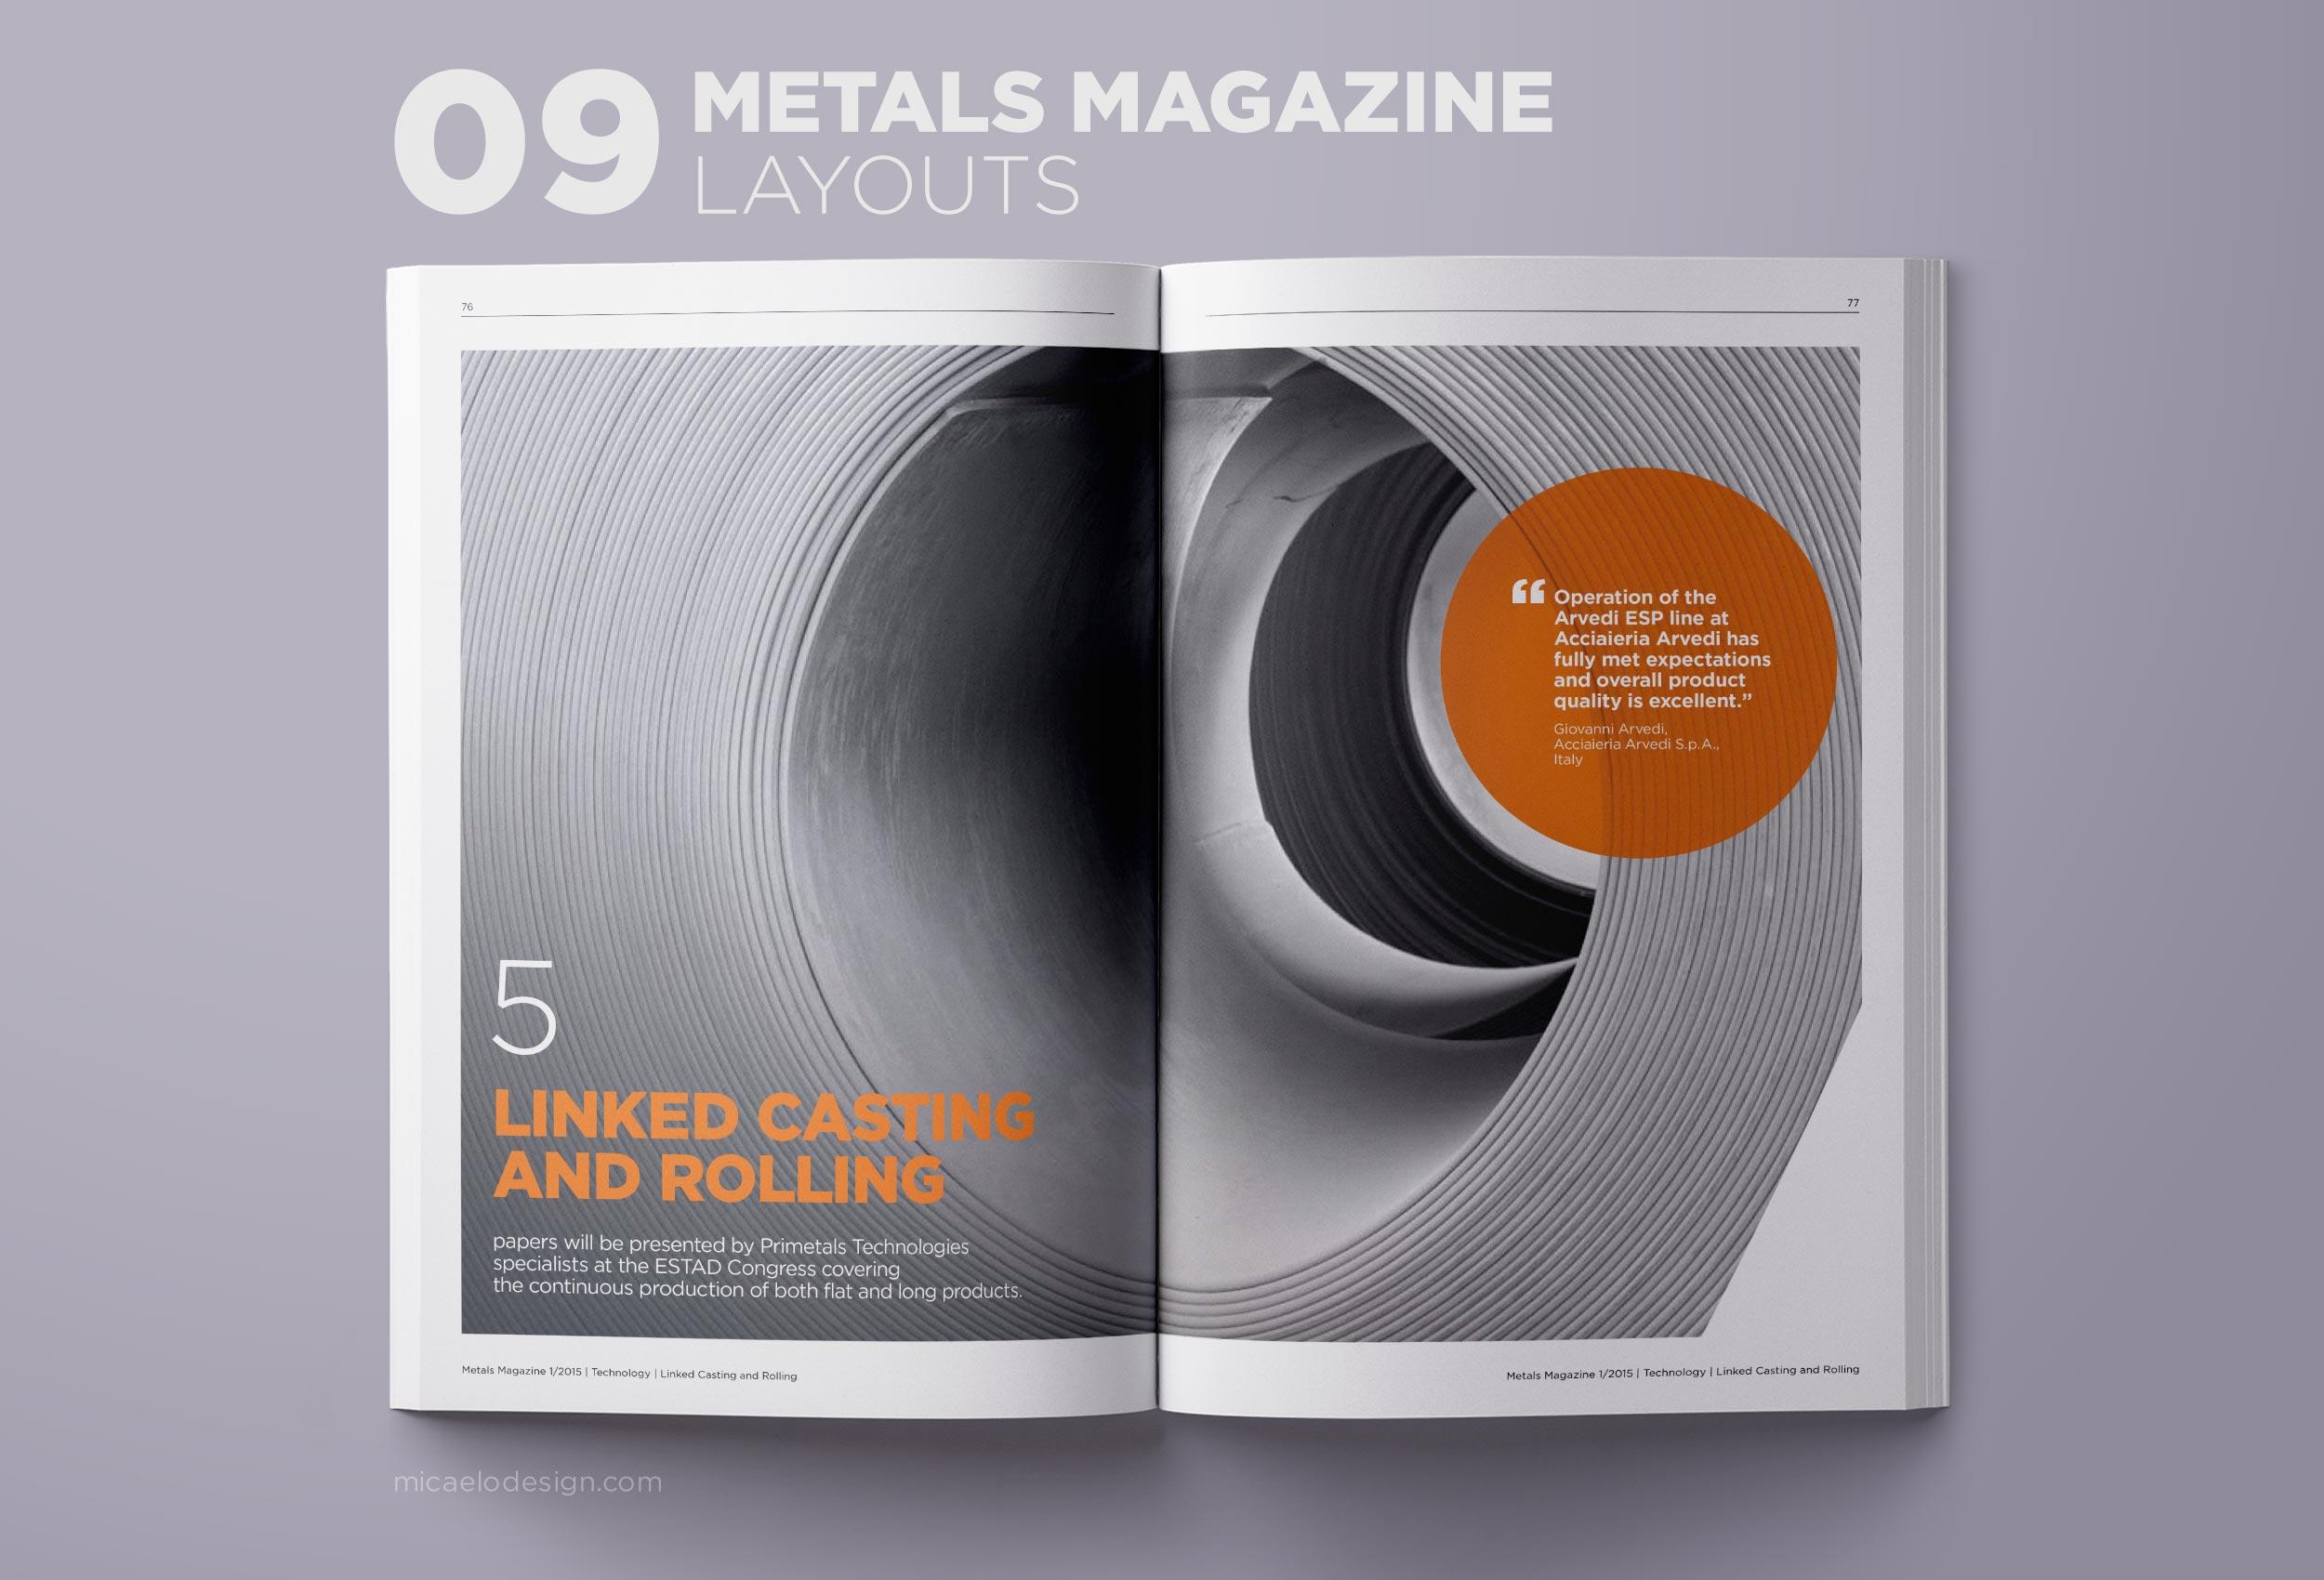 Primetals Metals Magazine layout N09